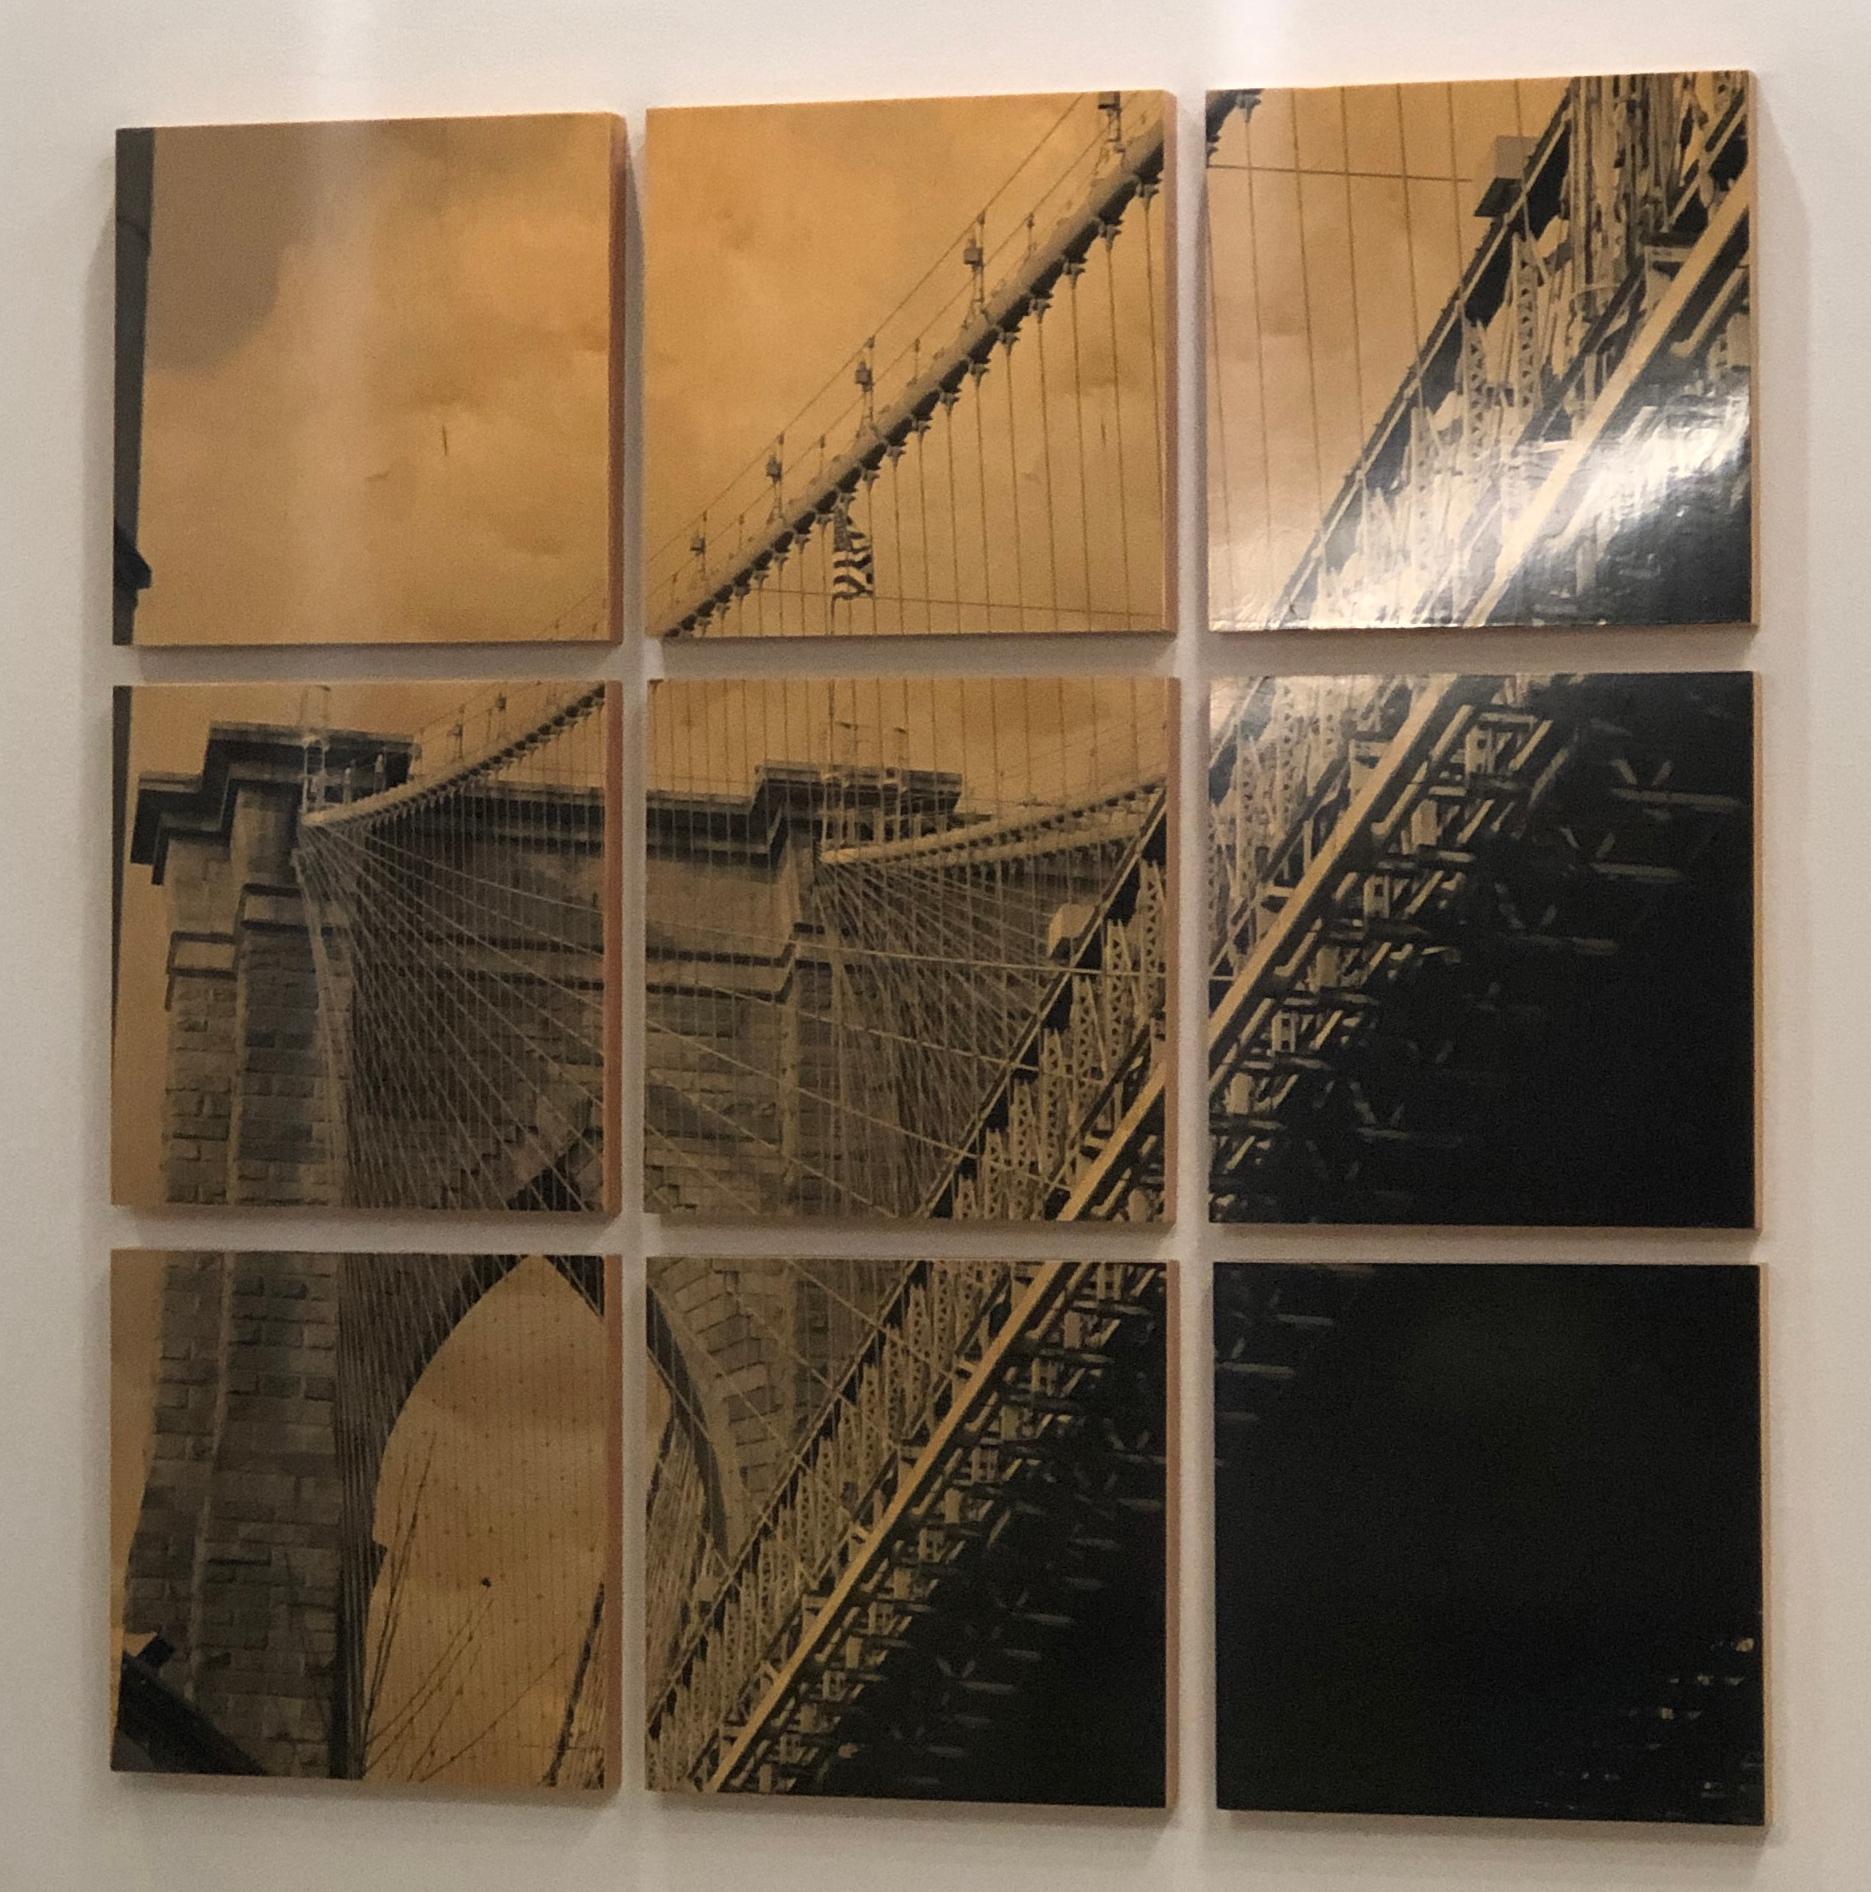 Brooklyn Bridge I, contemporary and elegant, mixed media photography on wood